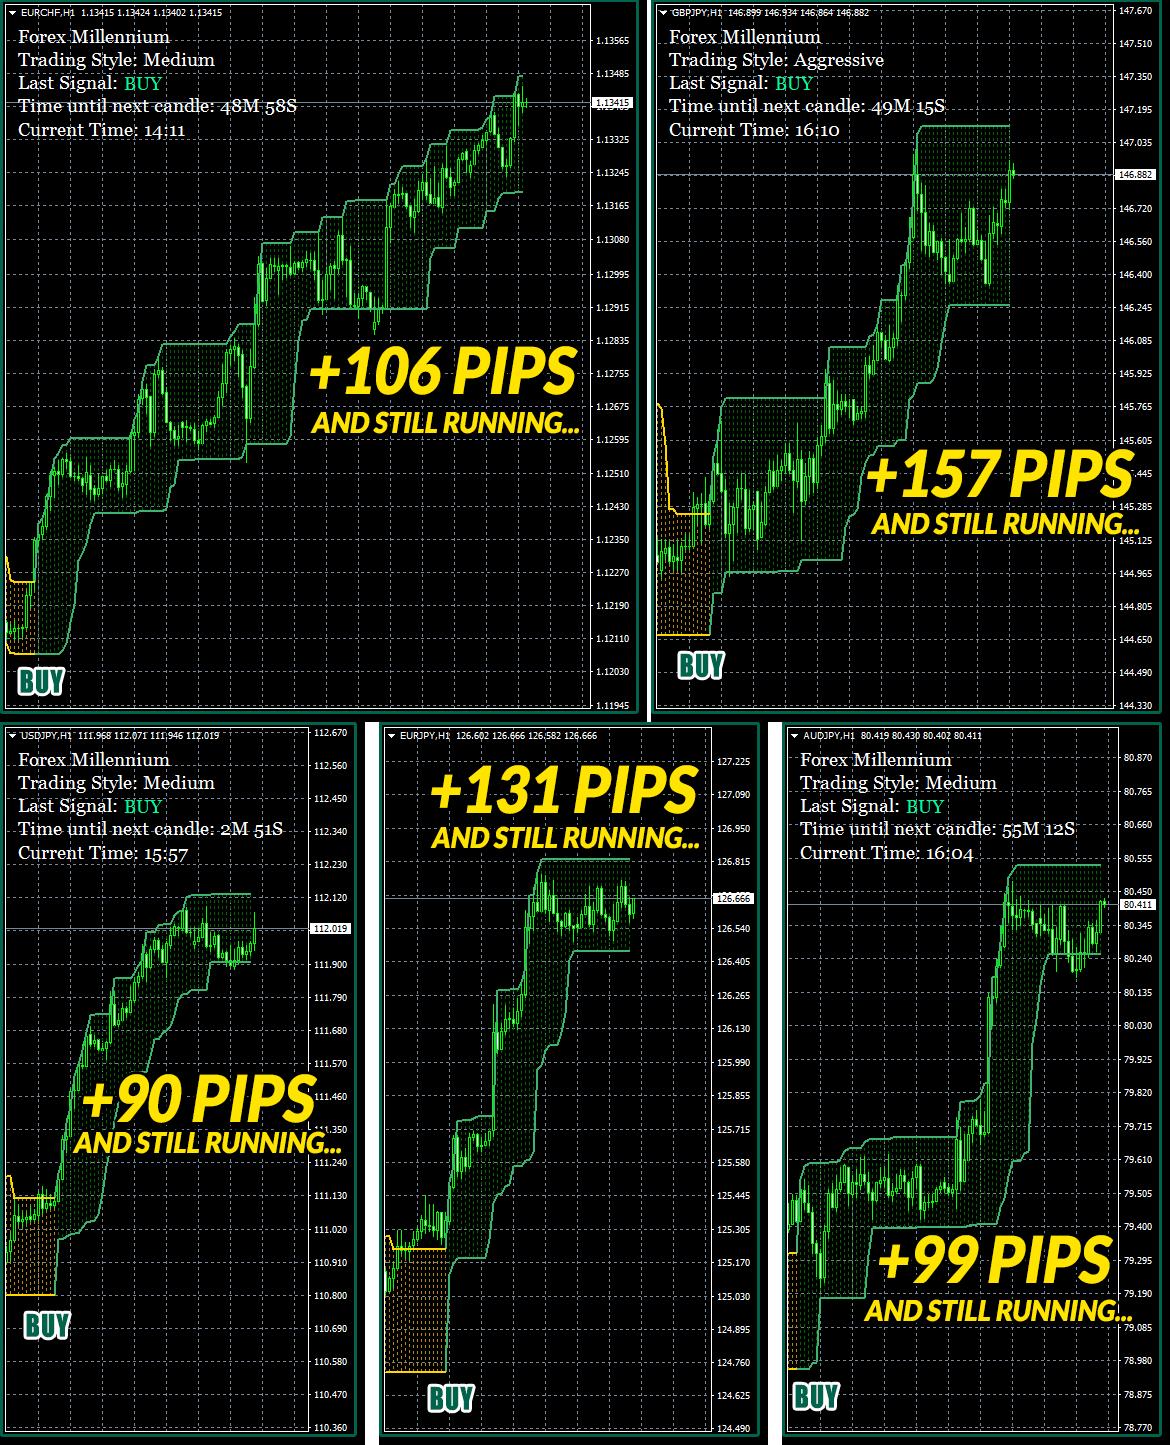 4 Monster Wins: +2829 Pips Total Profit!